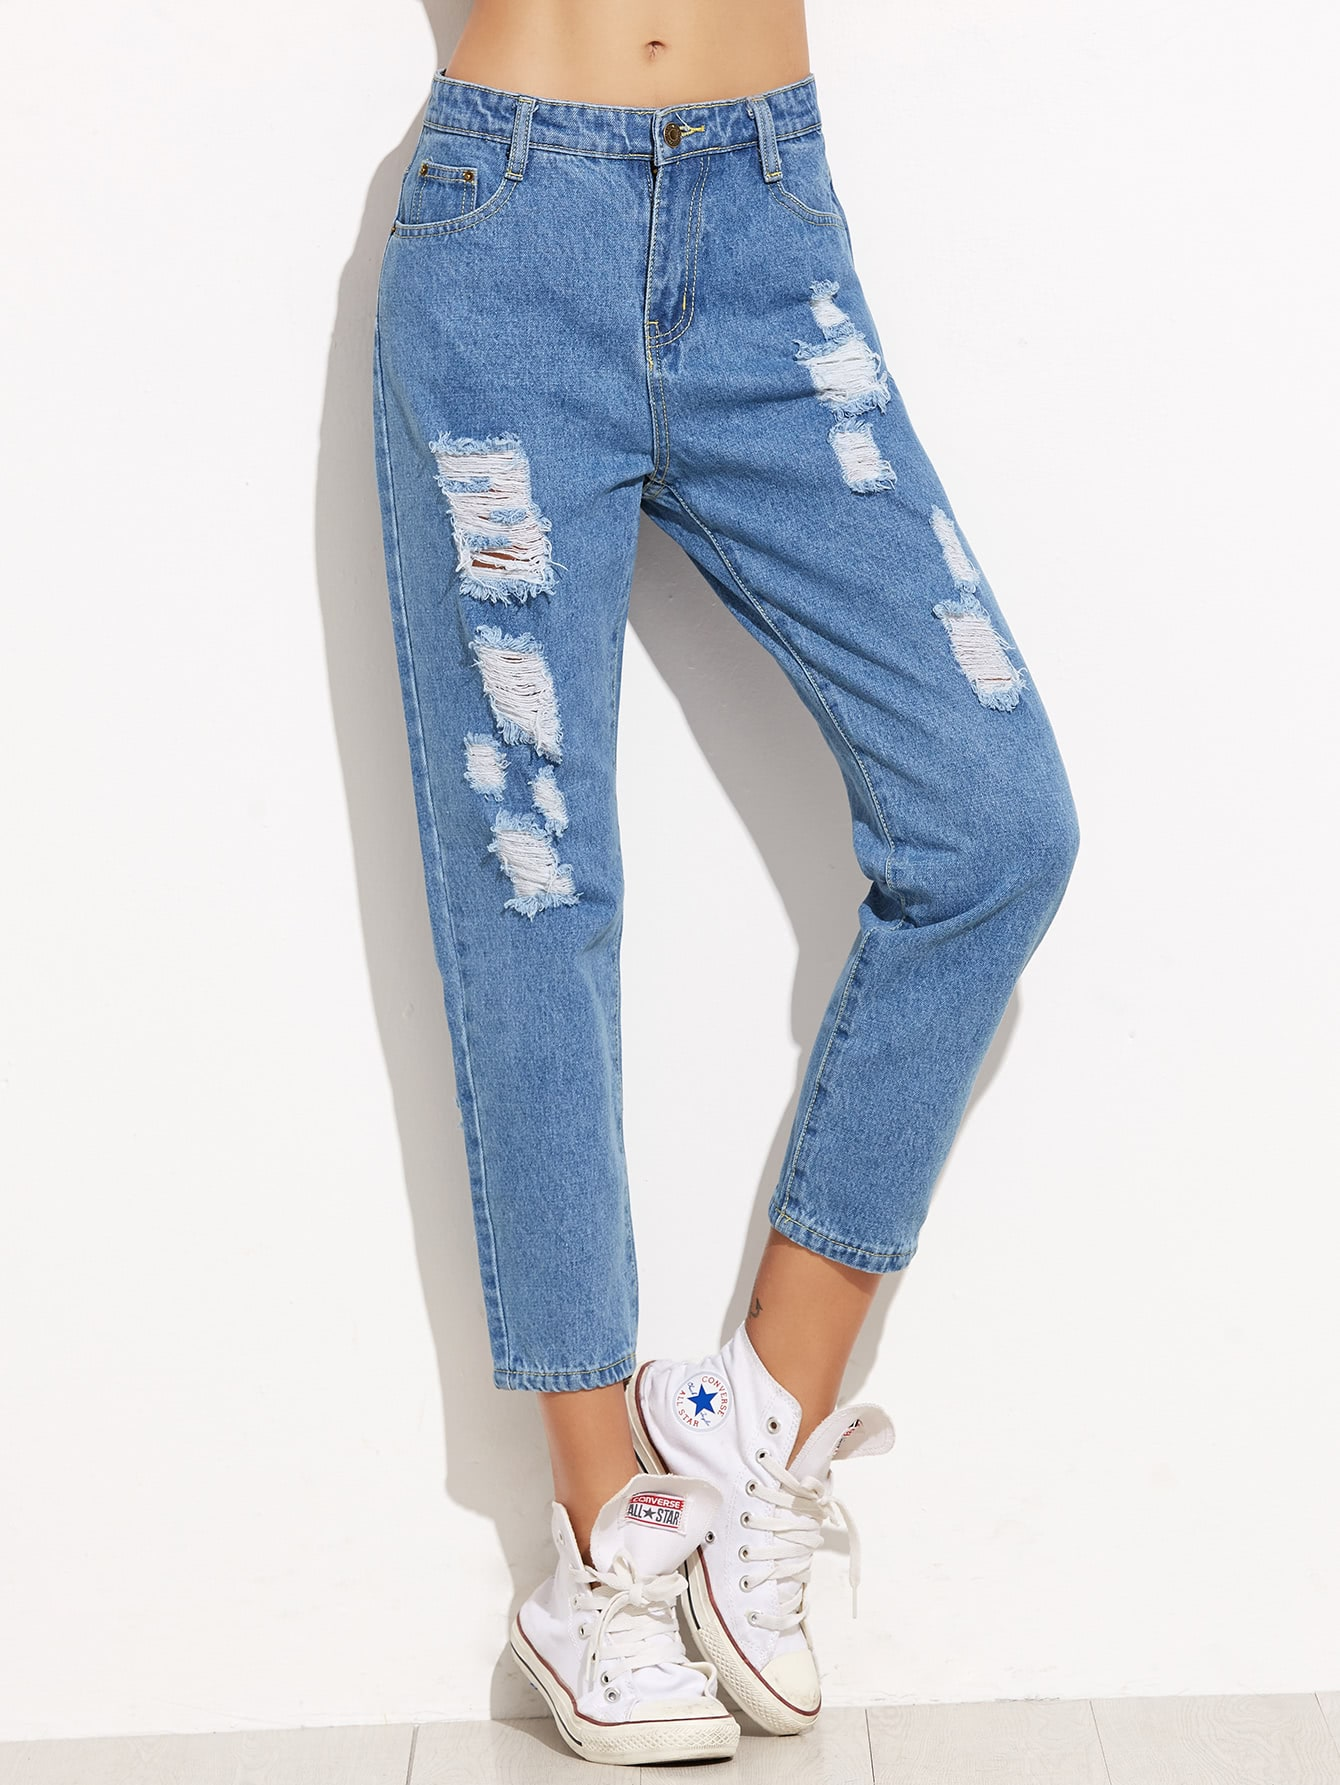 Blue Pockets Ripped Slim Denim PantBlue Pockets Ripped Slim Denim Pant<br><br>color: Blue<br>size: L,M,S,XL